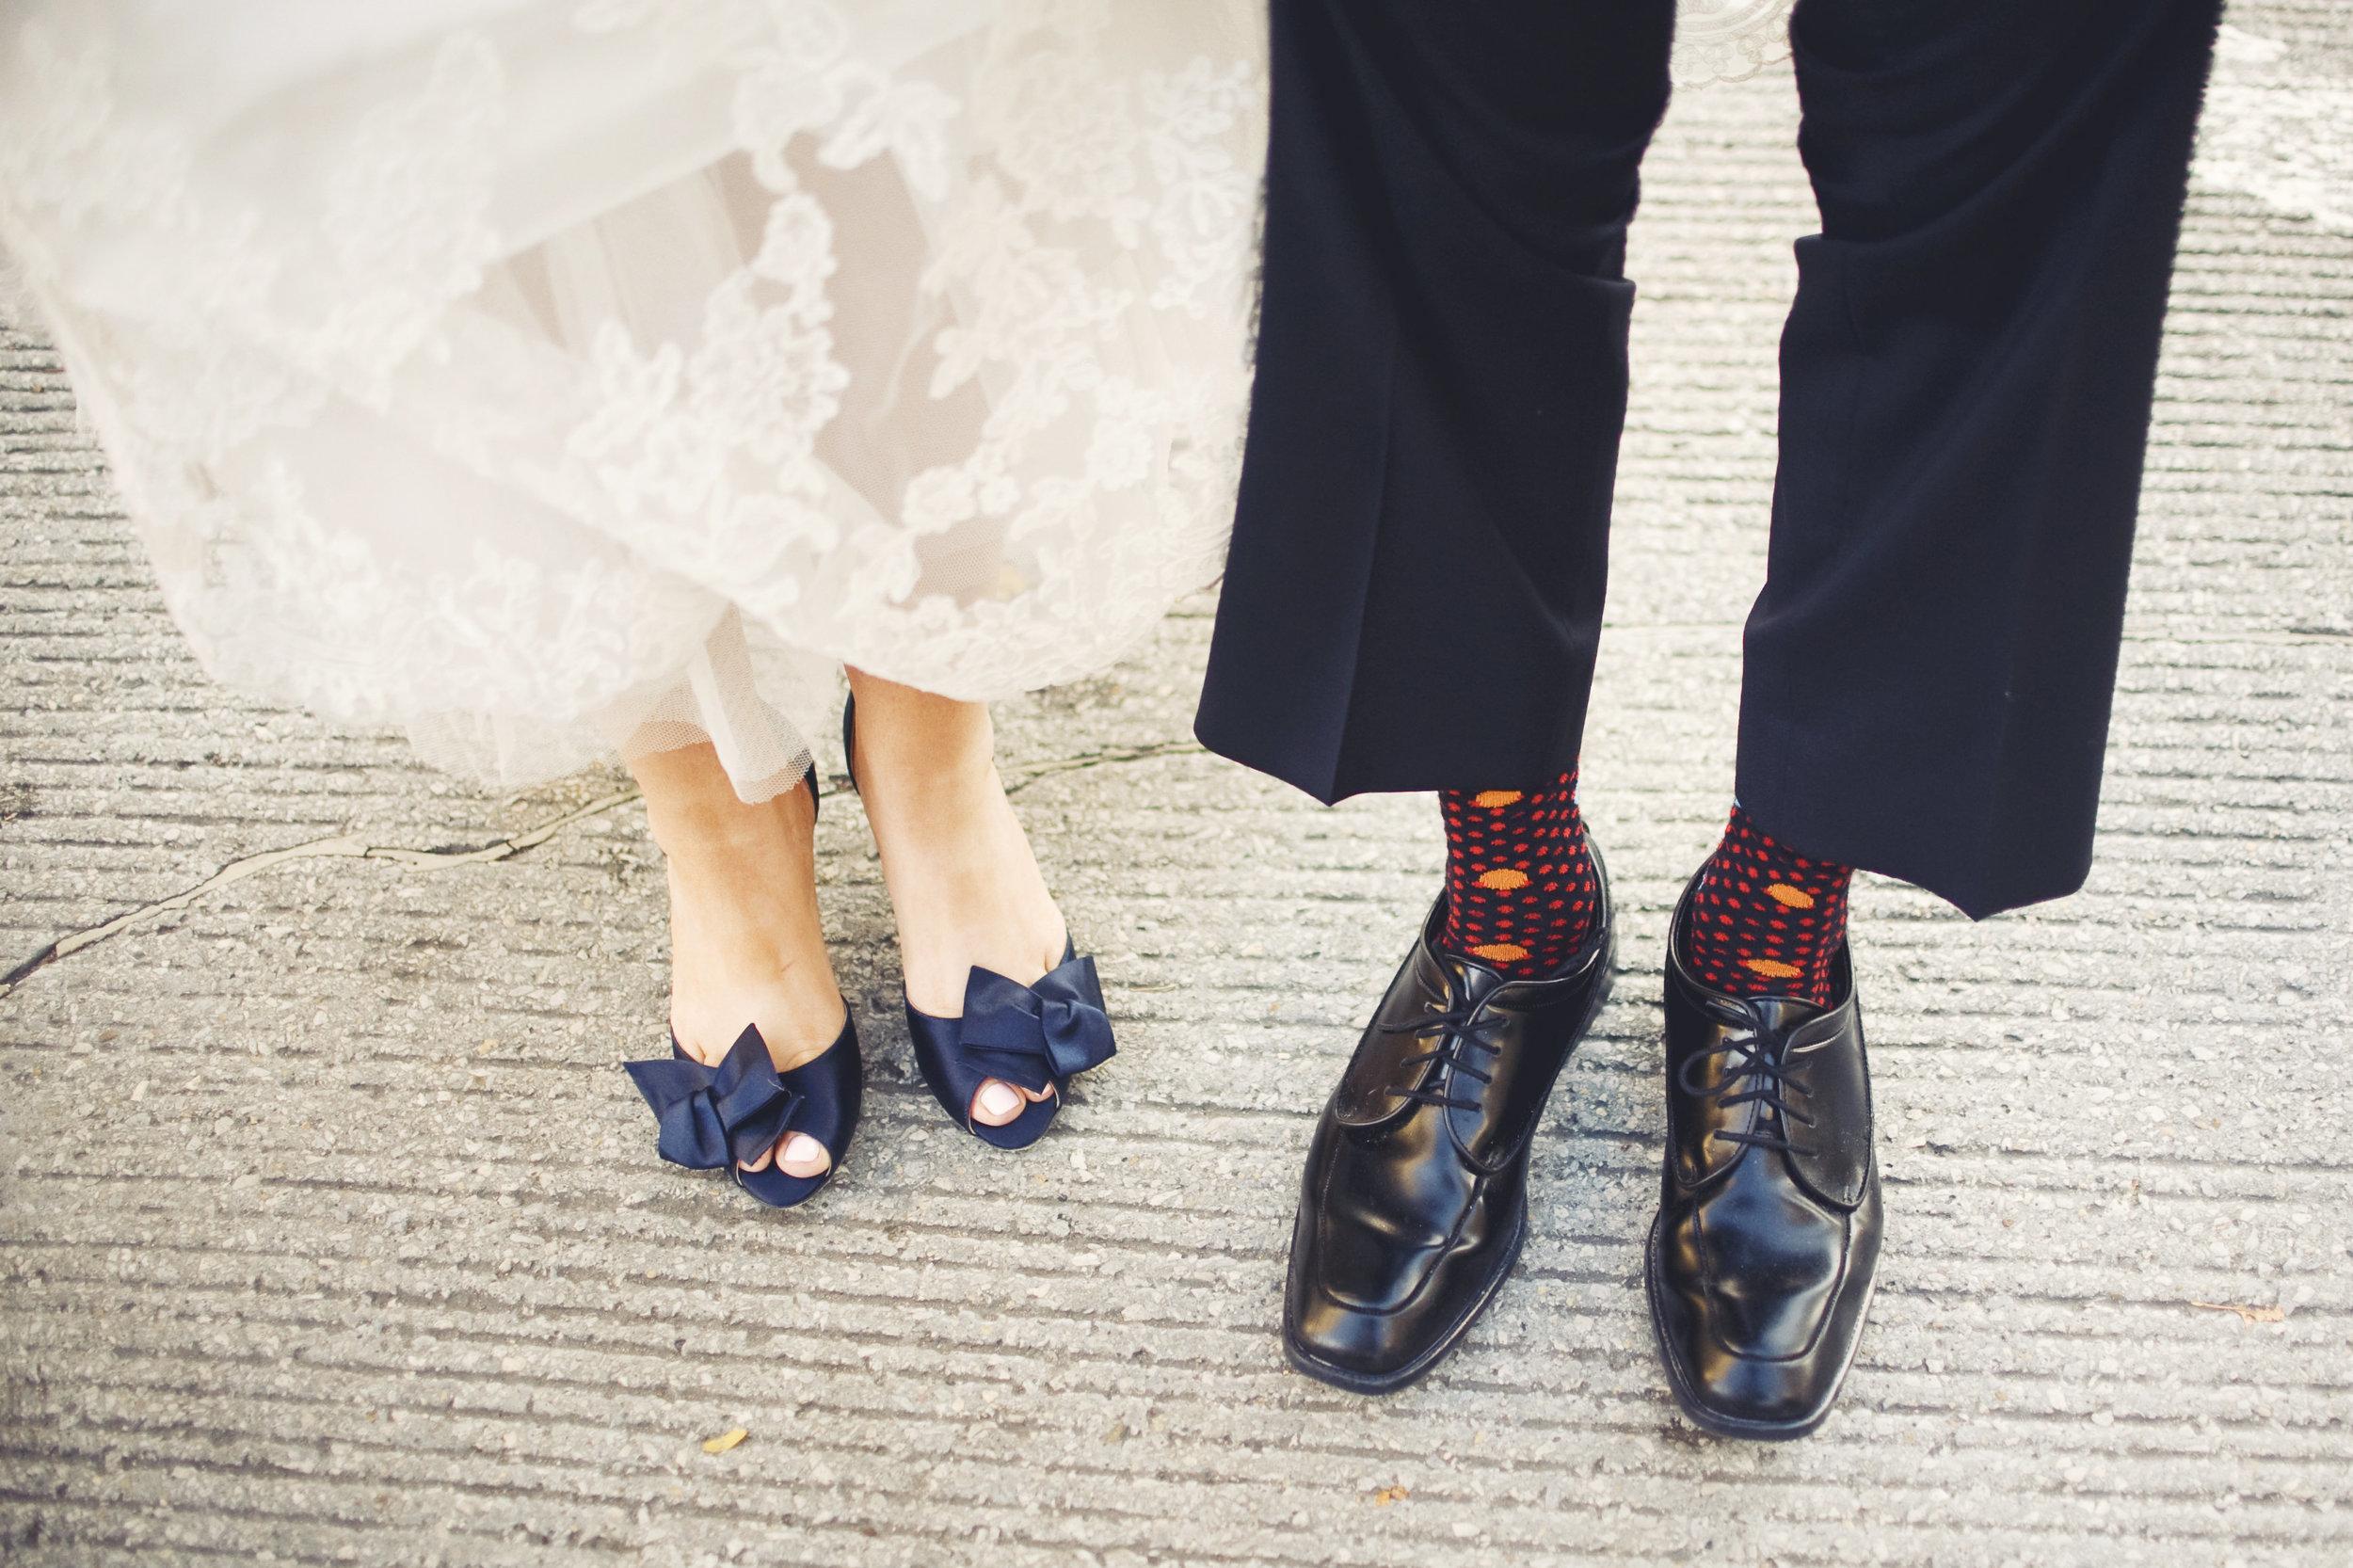 shoesshot.jpg